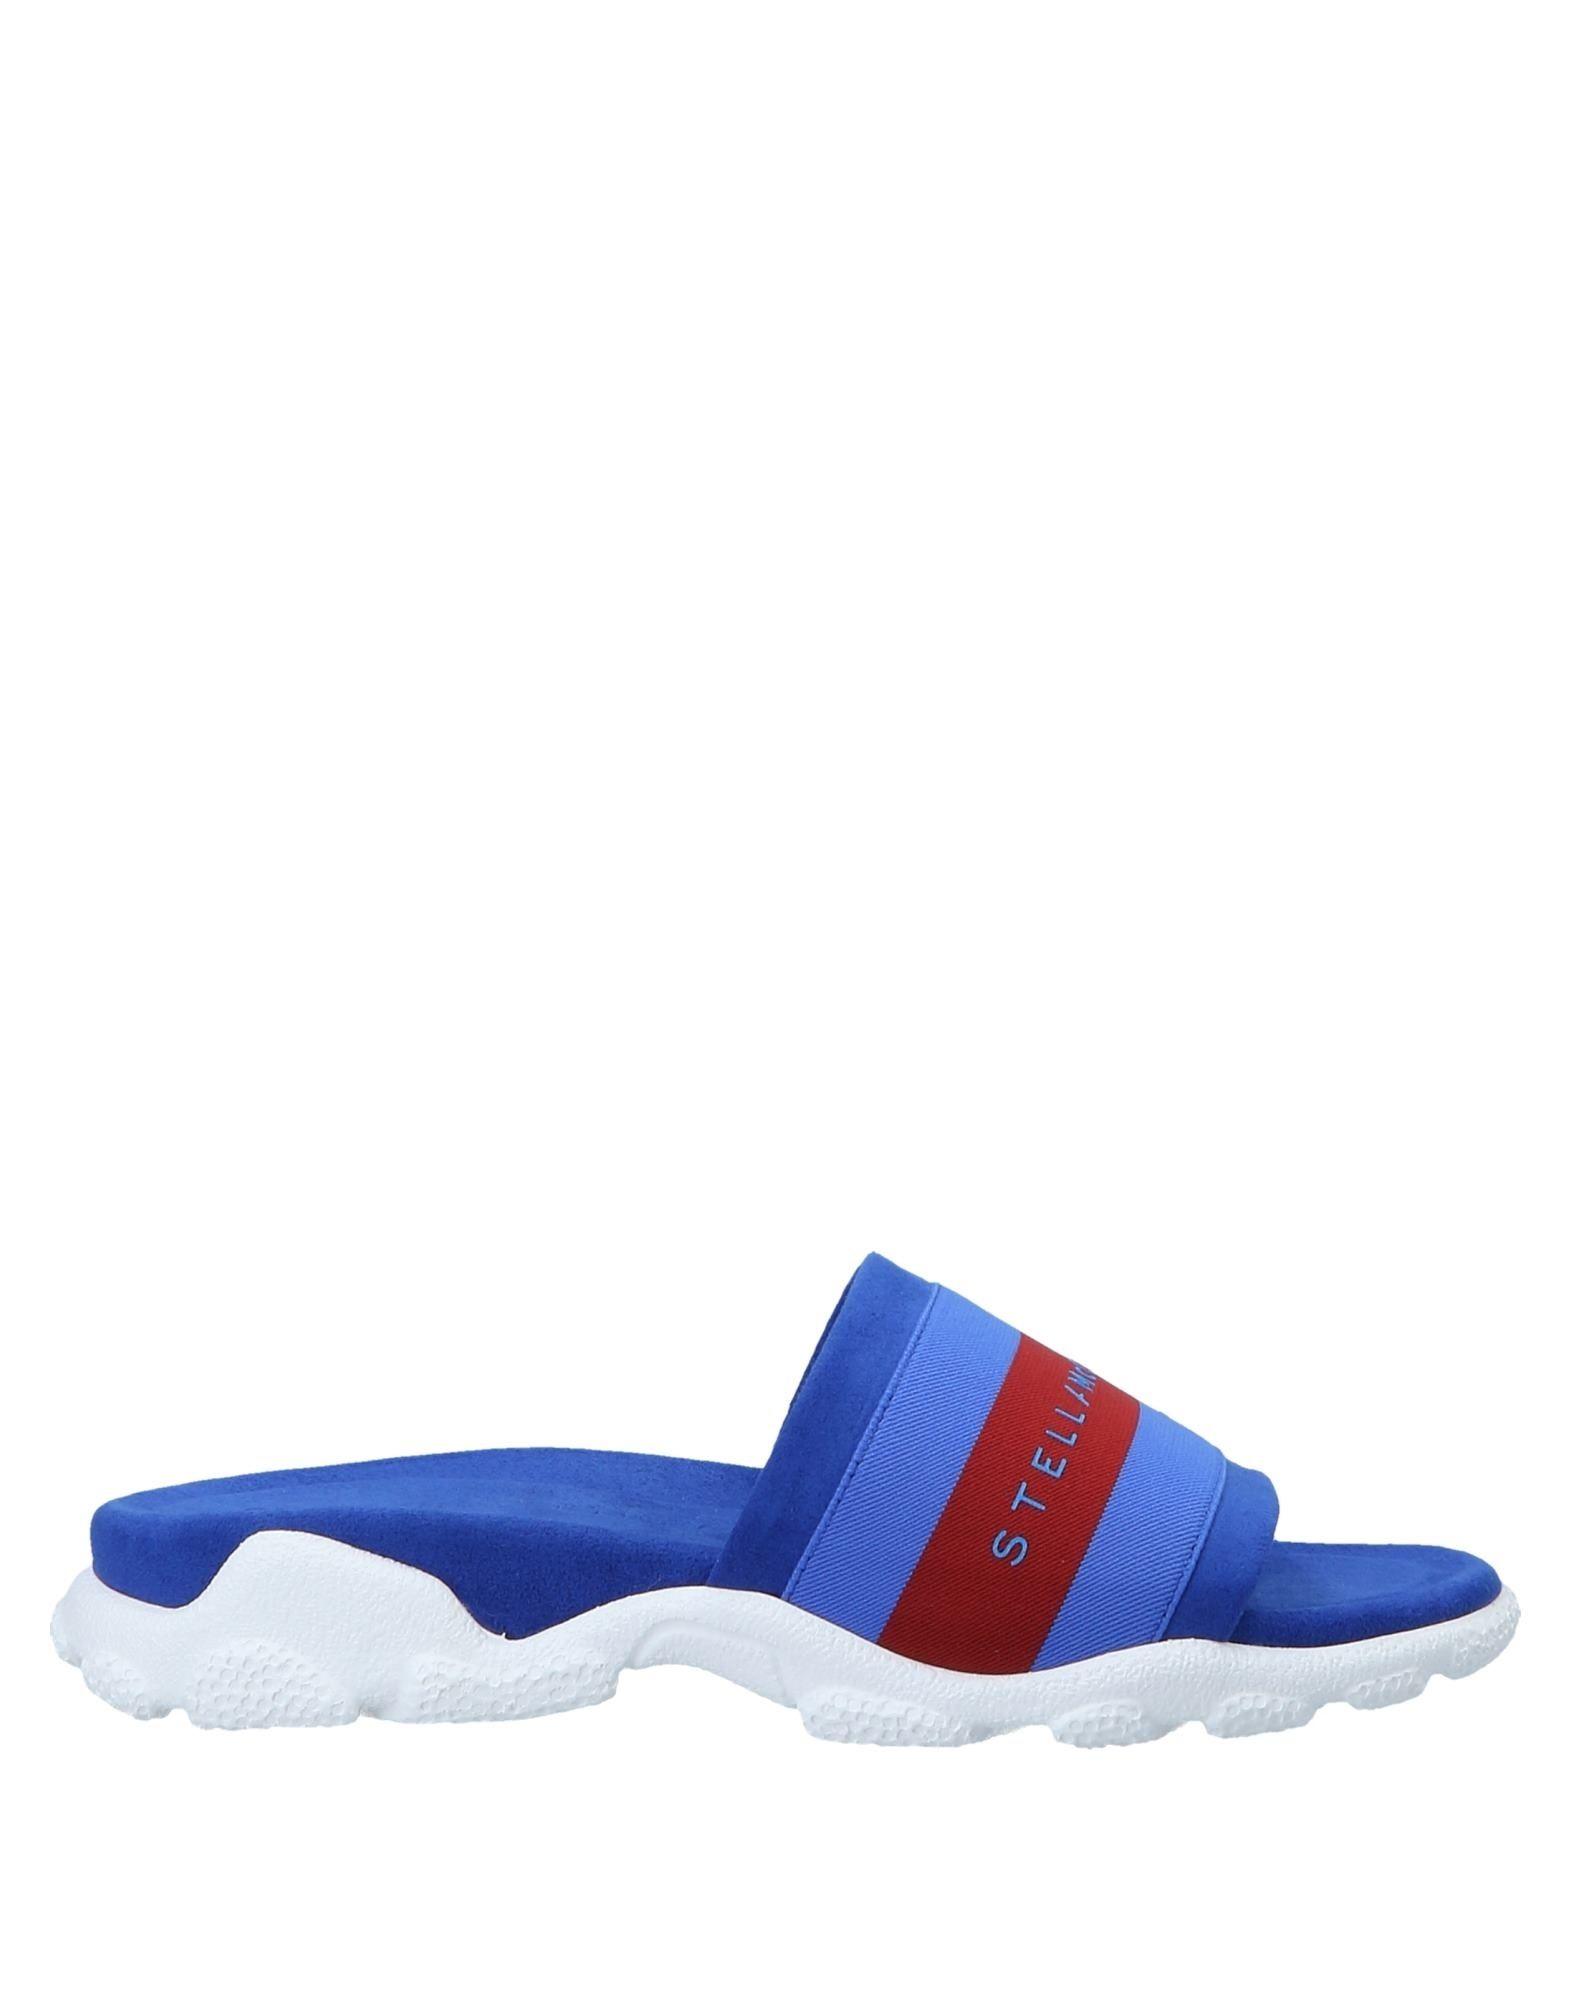 Rabatt Schuhe Stella Mccartney Sandalen Damen  11528890HO